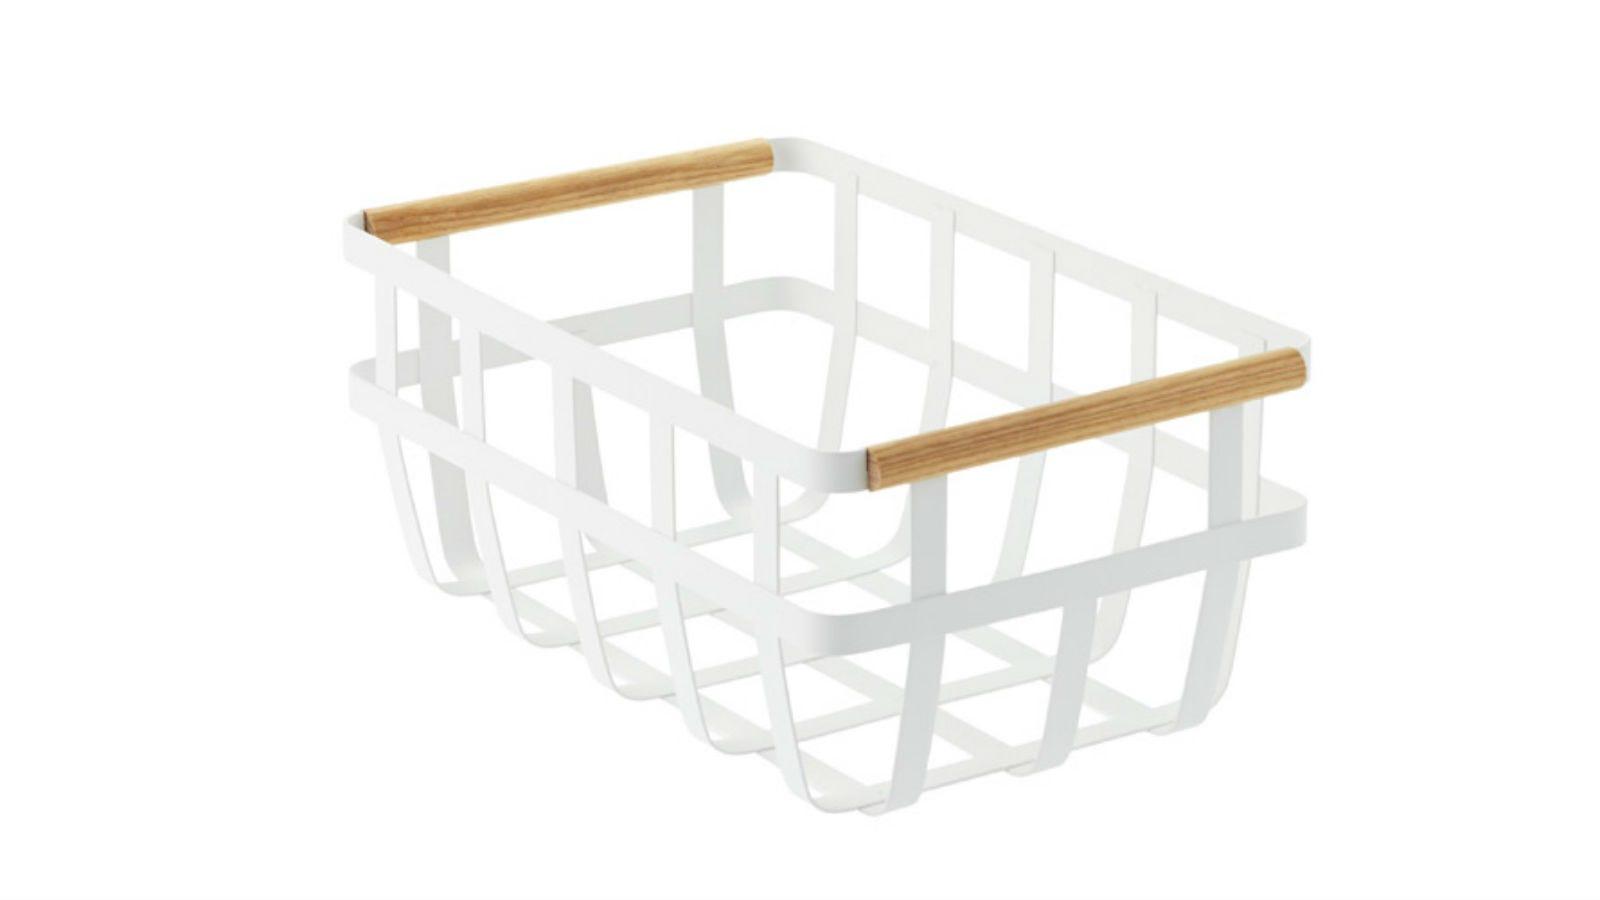 Yamazaki Tosca Baskets with Wooden Handles